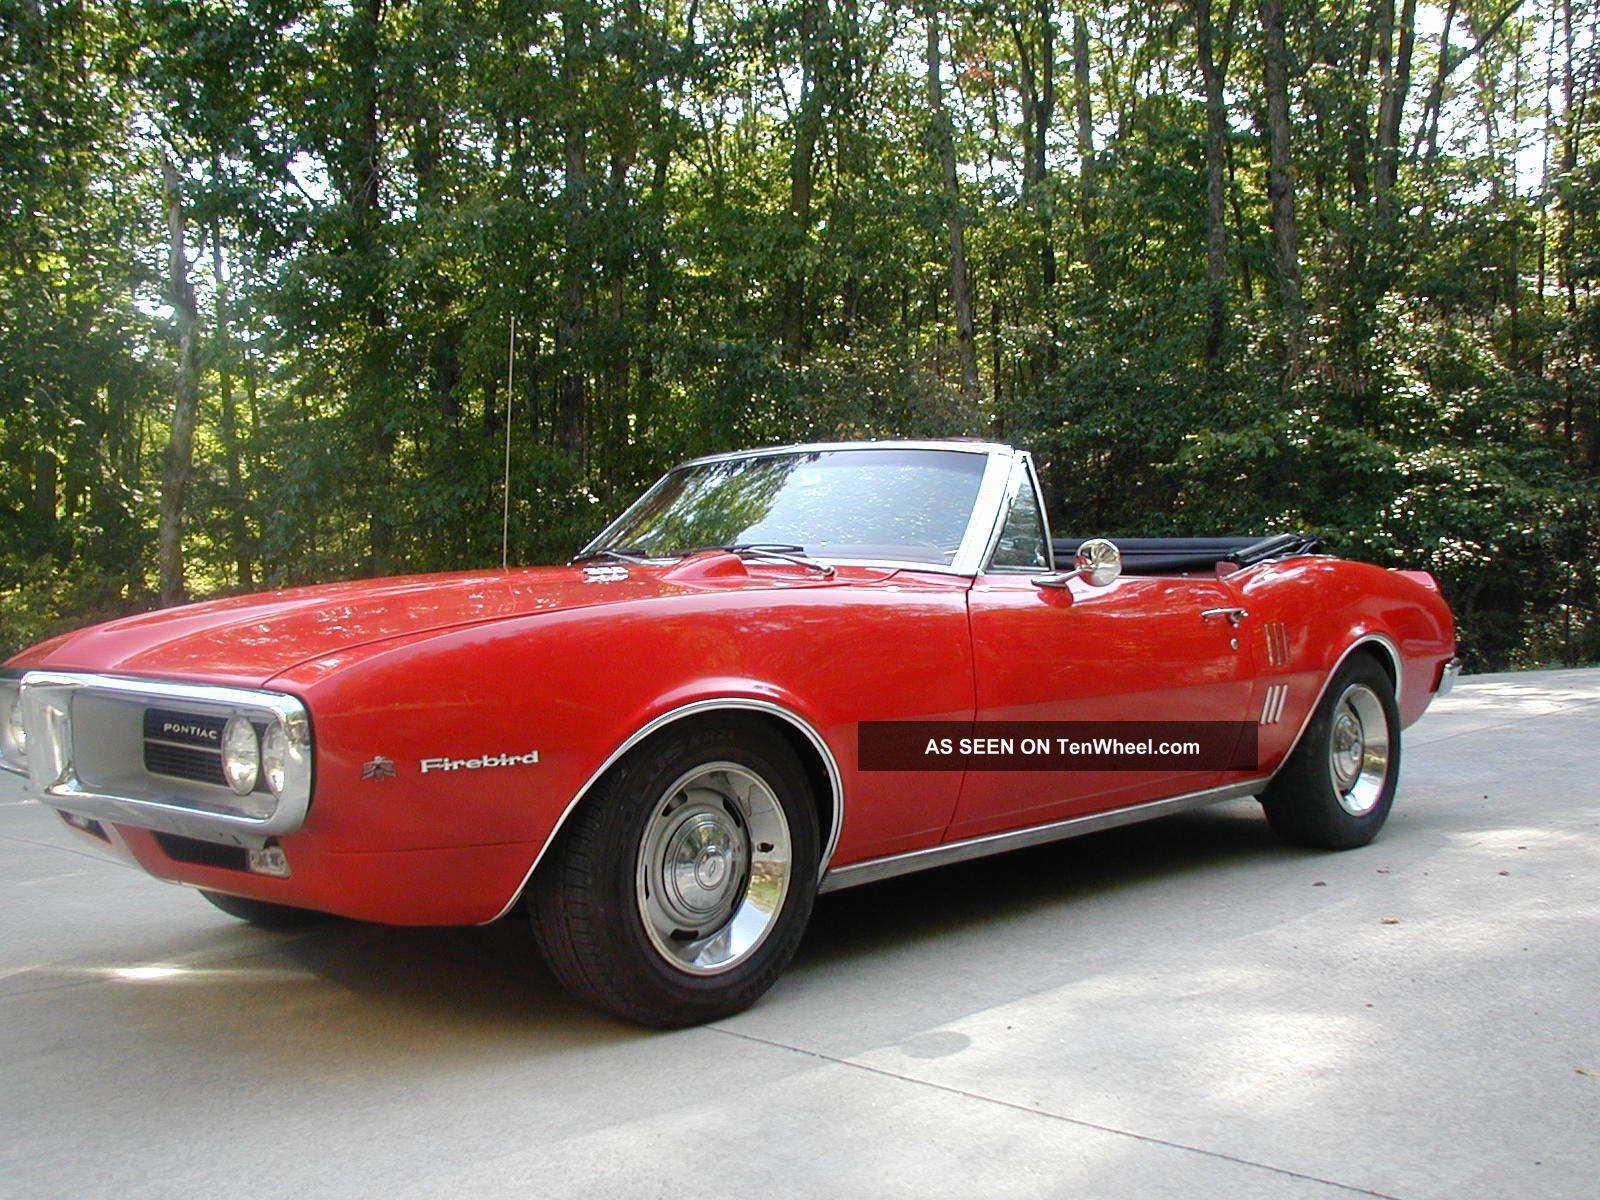 1967 Pontiac Firebird Convertible Not Camaro Firebird photo